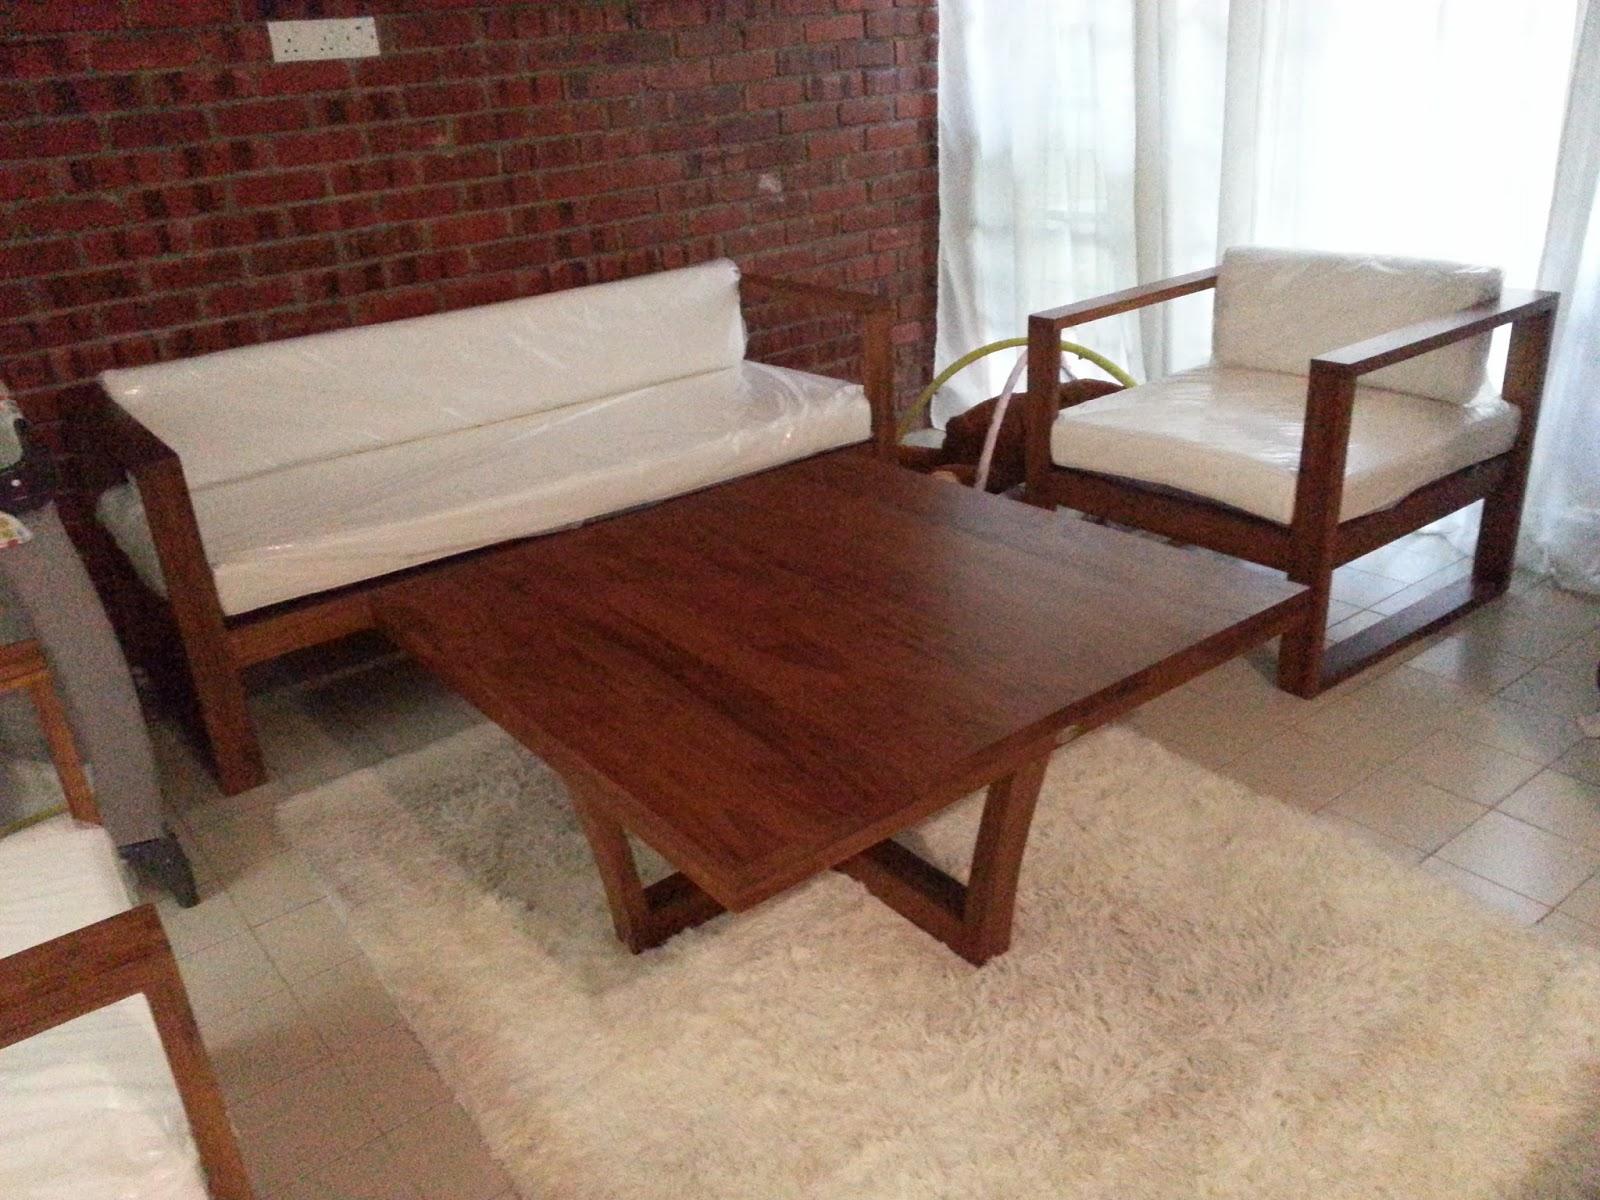 Teak Wood Furniture Malaysia And Outdoor Wicker Garden Furniture